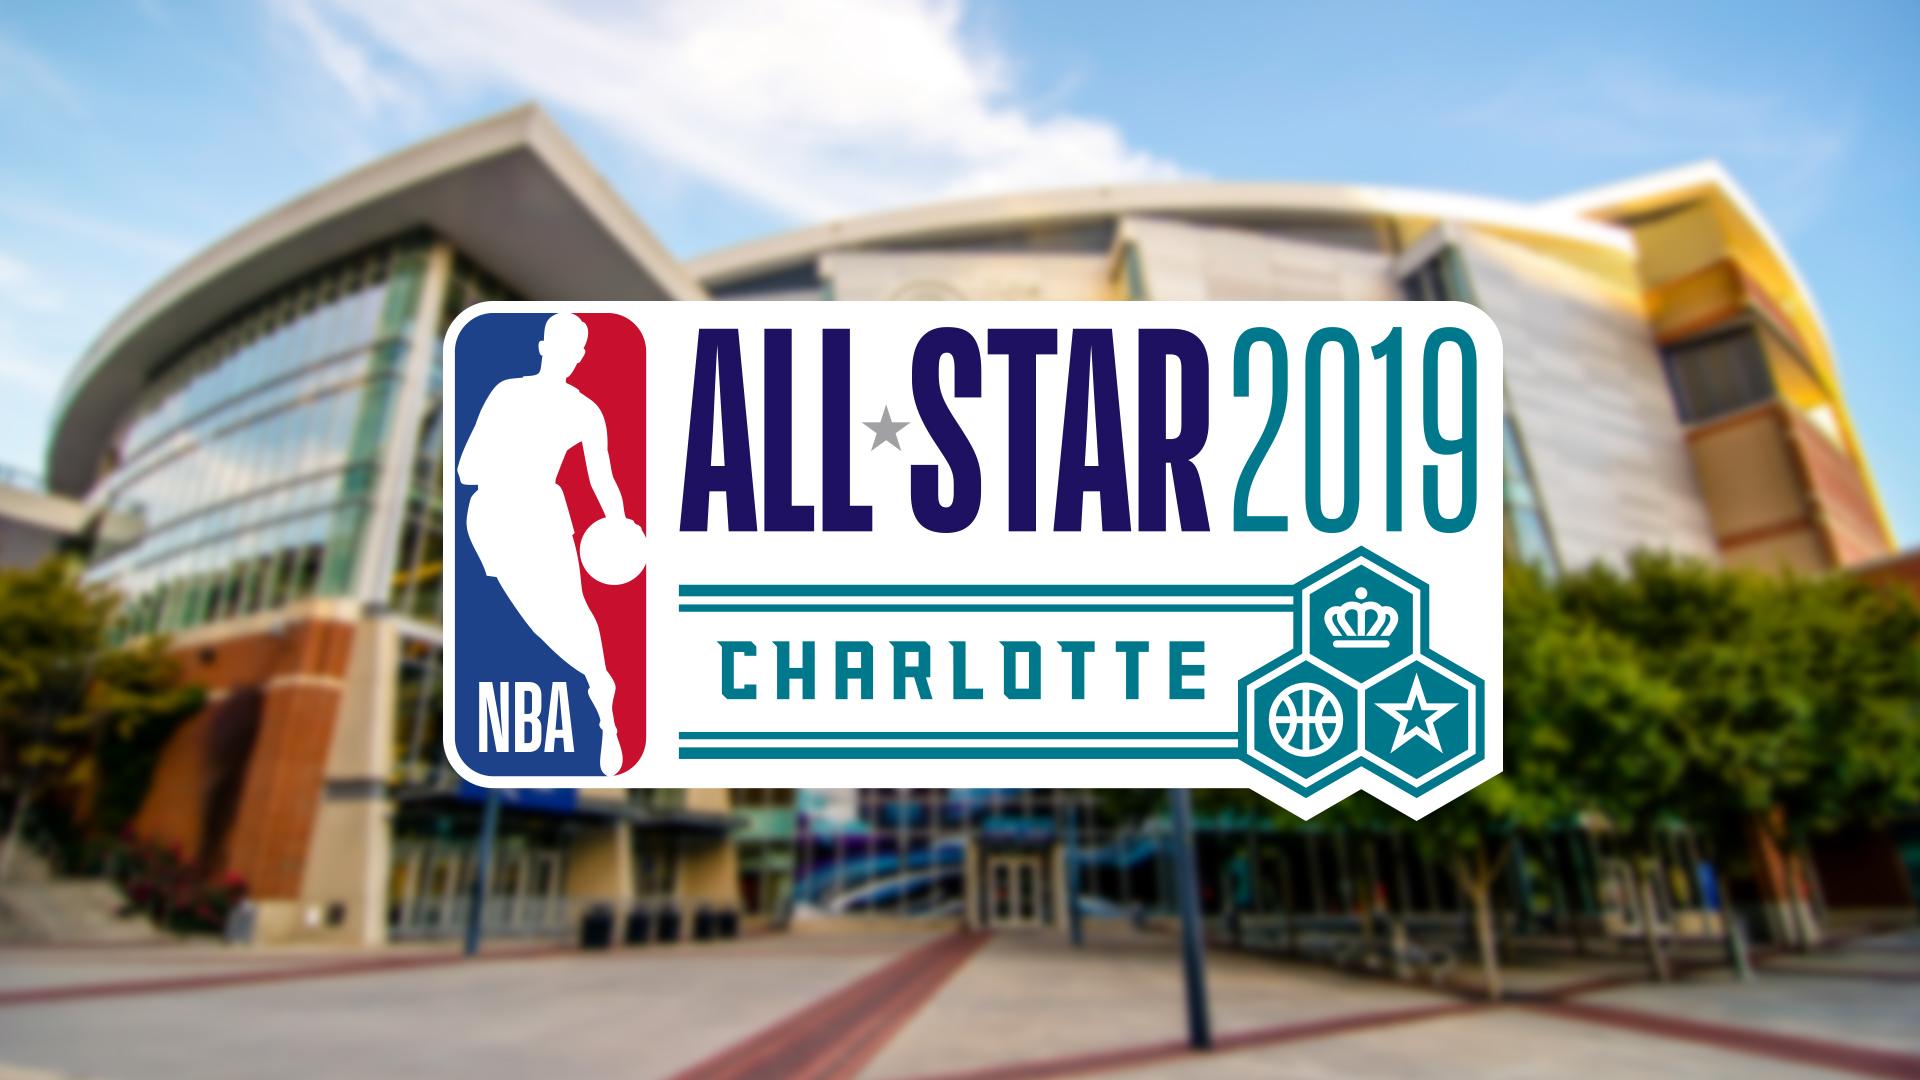 прогноз на матч НБА 18 февраля 2019 года - Команда ЛеБрона - Команда Янниса